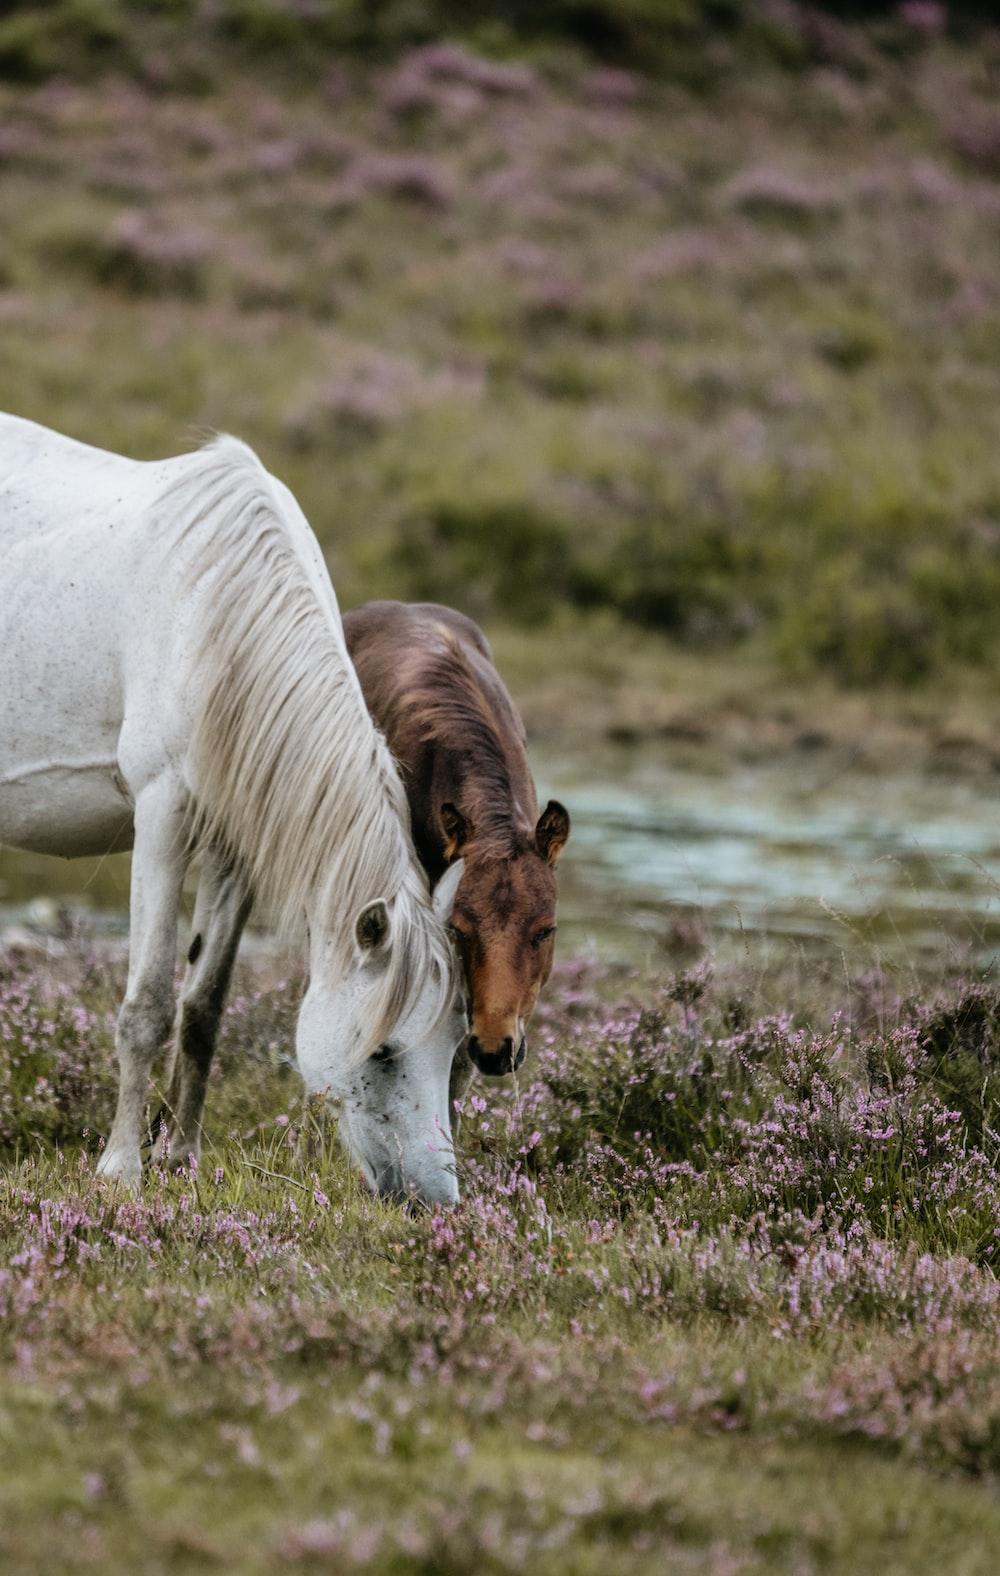 white horse standing near brown horse feeding on grass